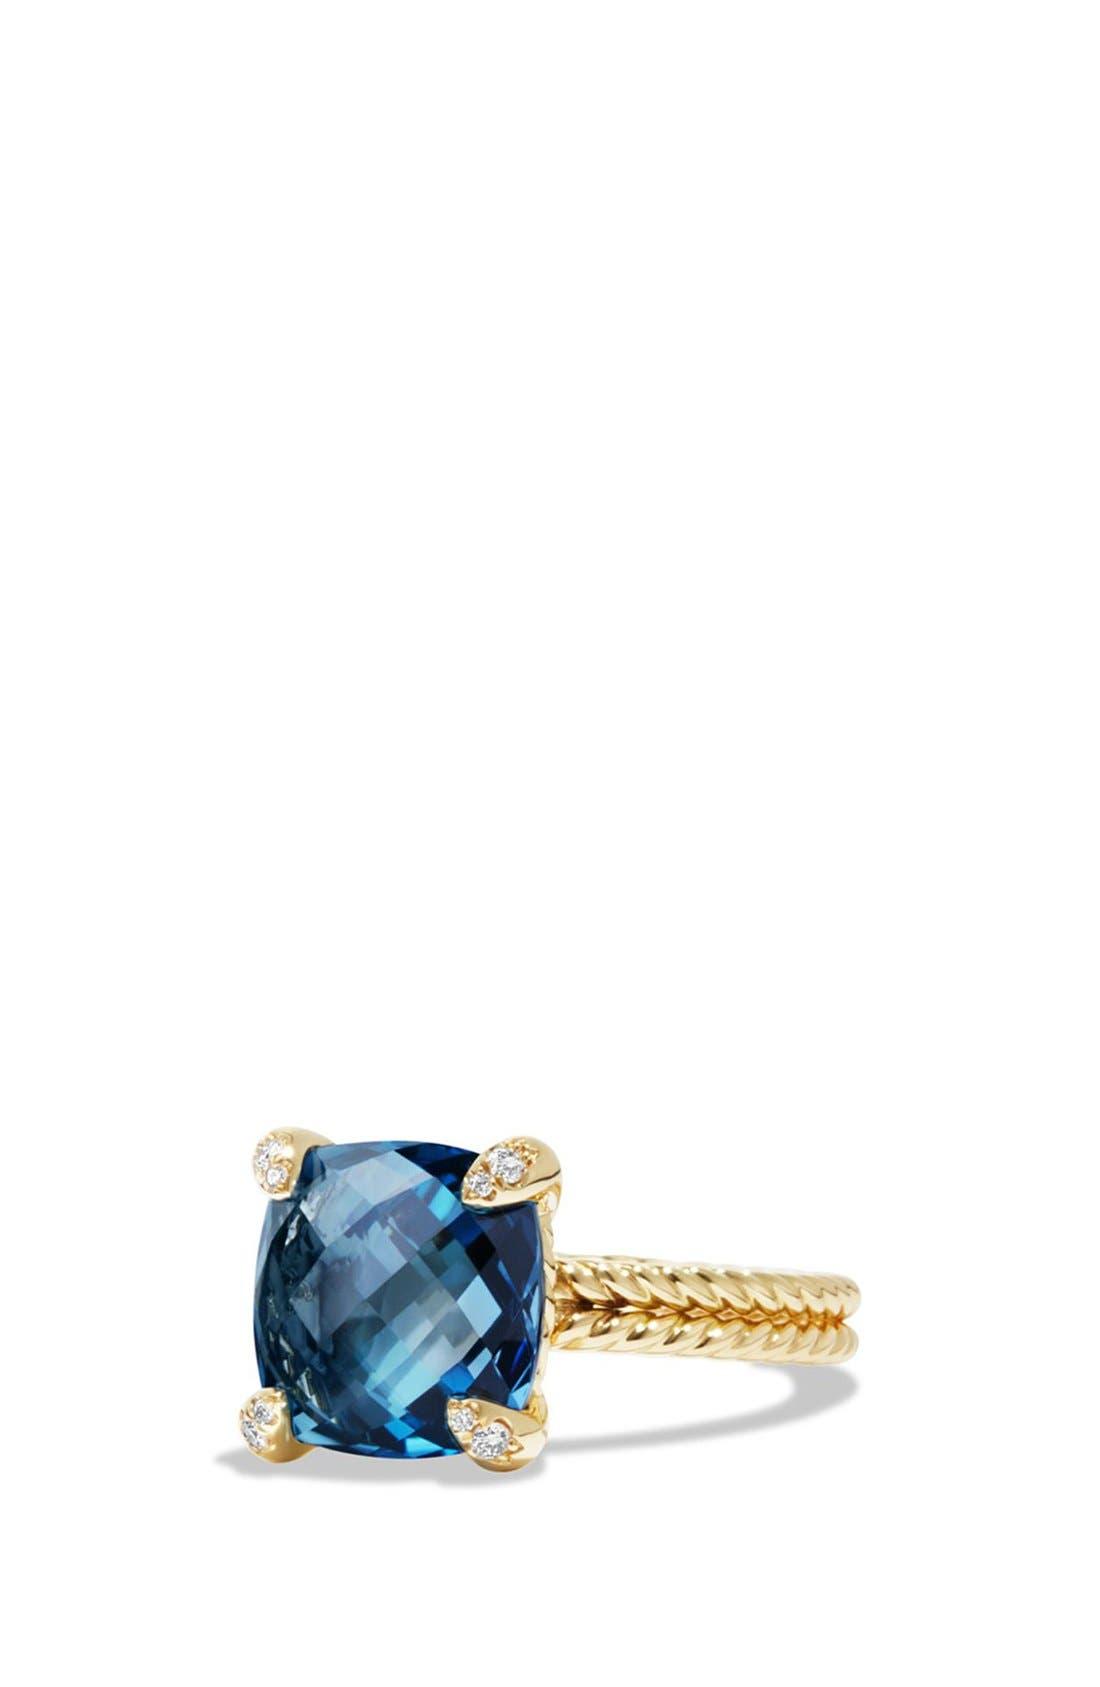 Main Image - David Yurman Châtelaine Ring with Hampton Blue Topaz and Diamonds in 18K Gold